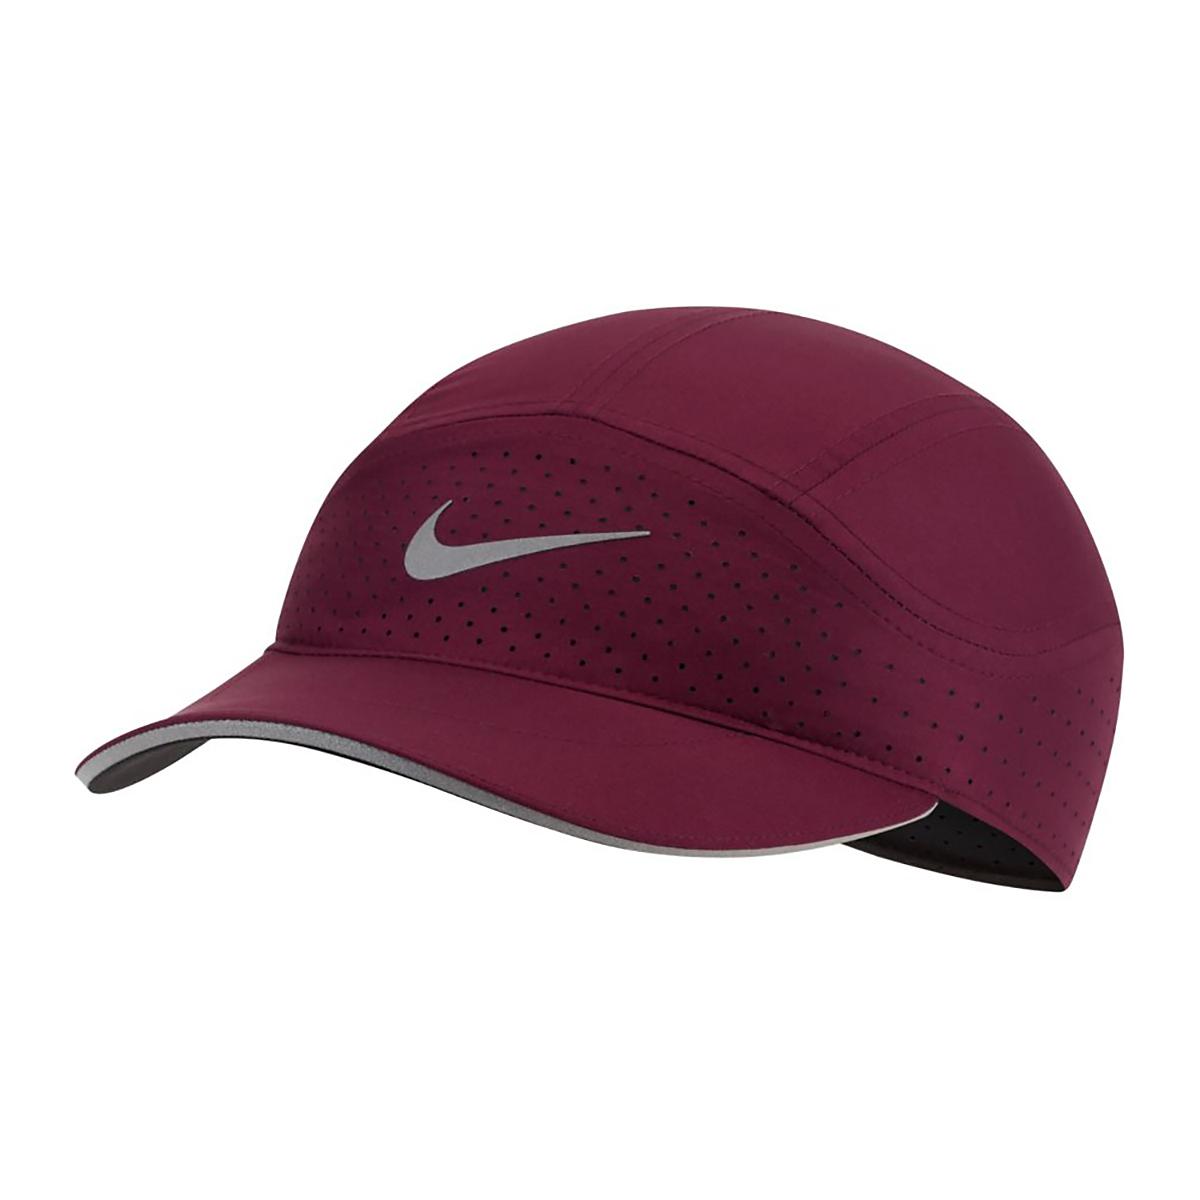 Women's Nike Aerobill Tailwind Elite Cap - Color: Maroon, Maroon, large, image 1